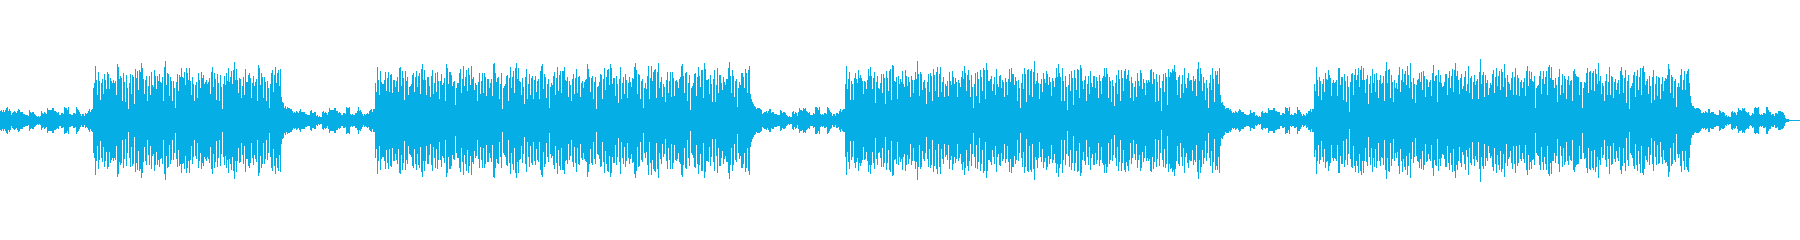 LATRO×Trap Beatの再生済みの波形